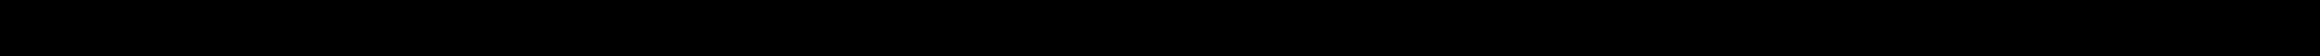 MANN-FILTER 4920158, 1103827, 4-9540000111, 76-11900535100, 76-12915035151 Oljefilter